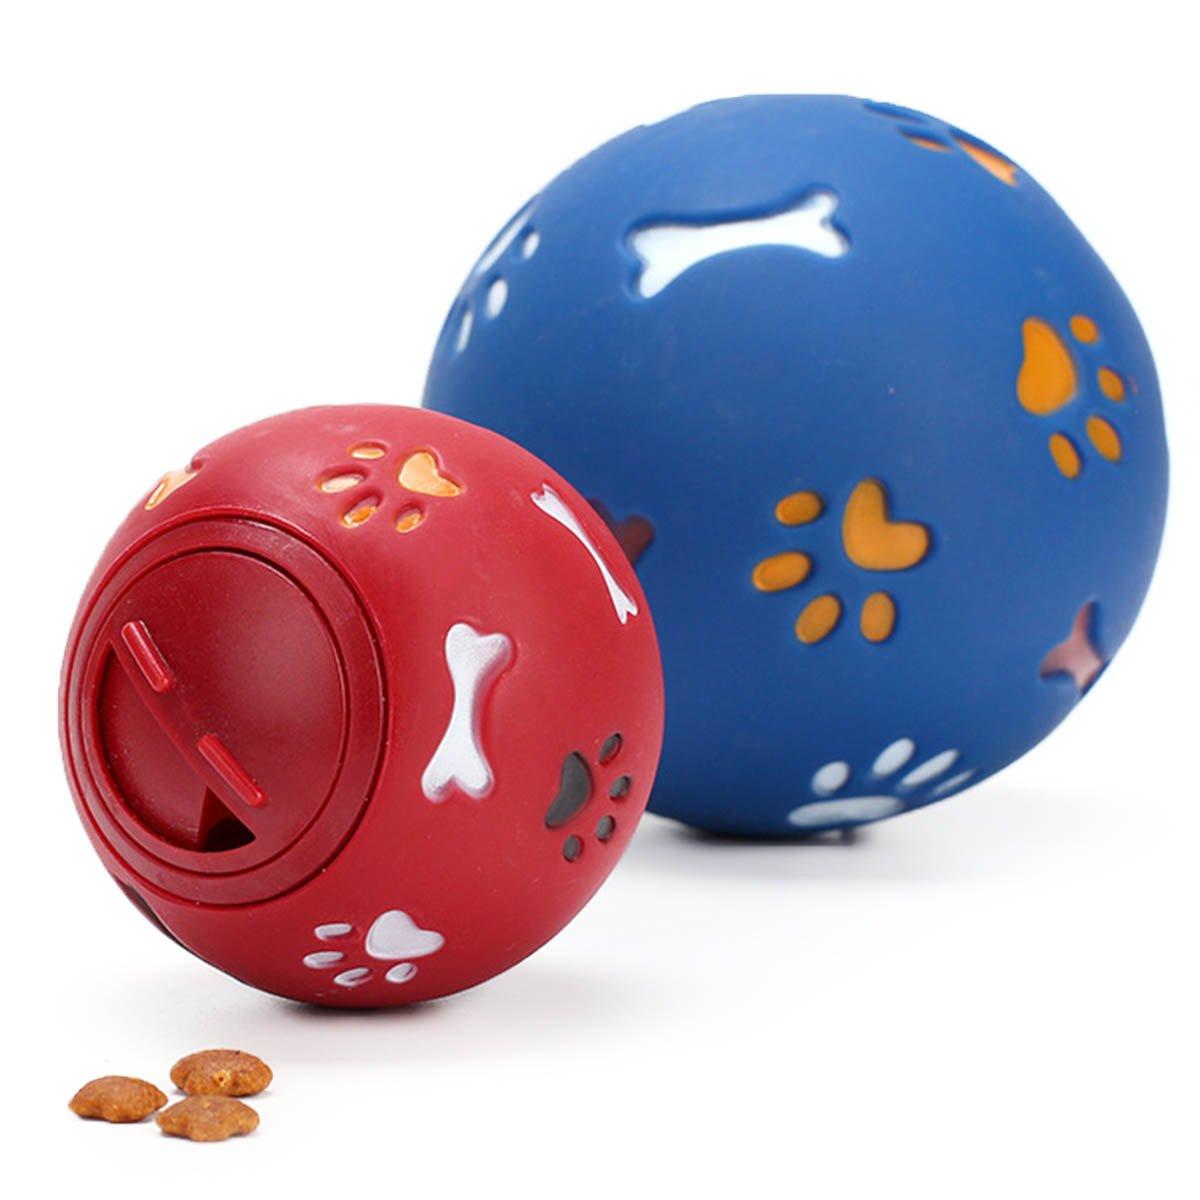 Vegxpet Juguete para Mascotas IQ Ball Interacative Puppy Treat Ball dispensador de Alimentos Actividad Bite Juguete